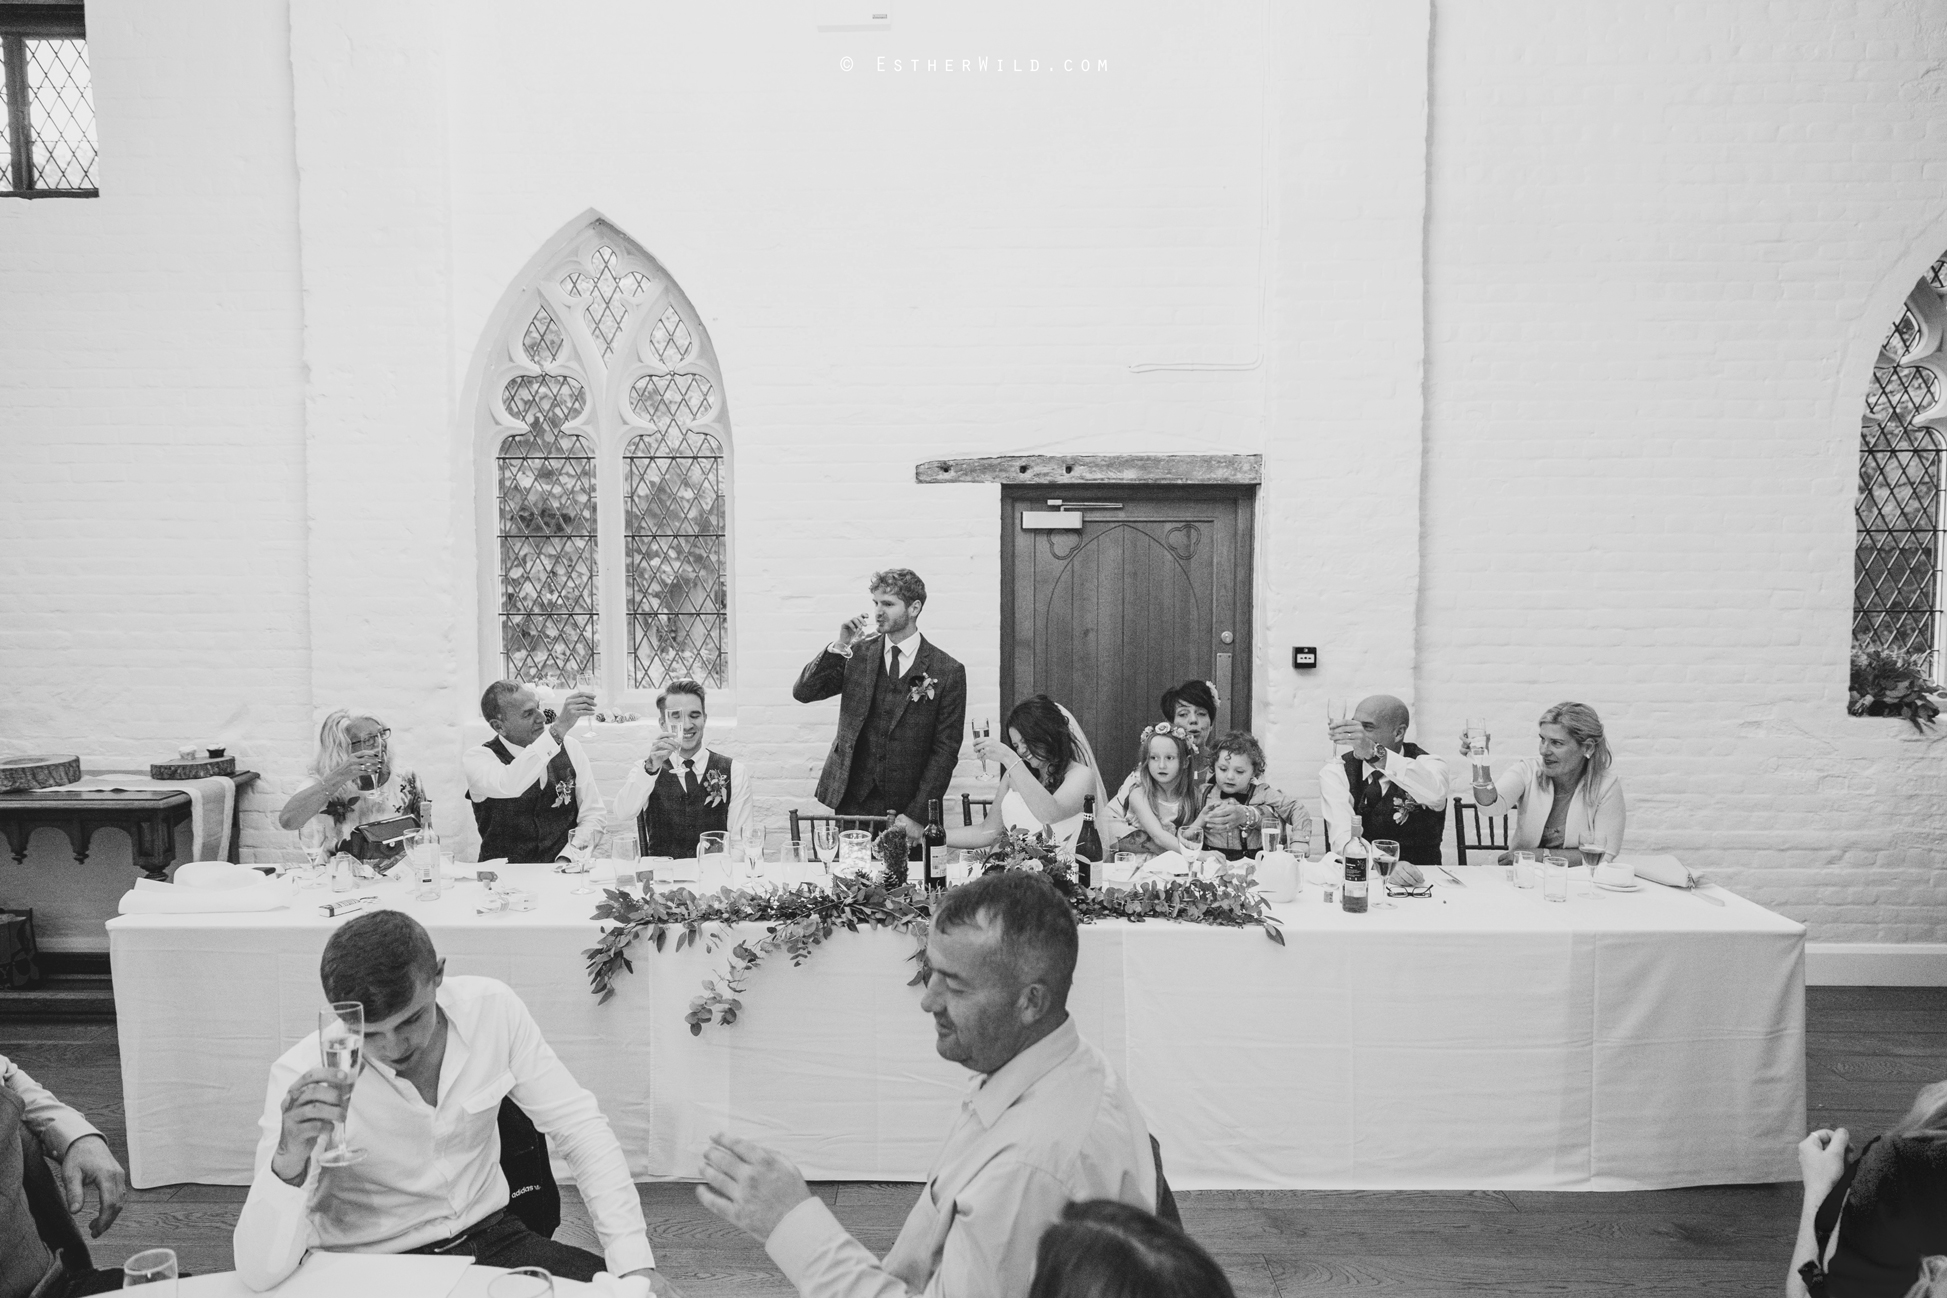 Reading_Room_Weddings_Alby_Norwich_Photographer_Esther_Wild_IMG_2236-1.jpg